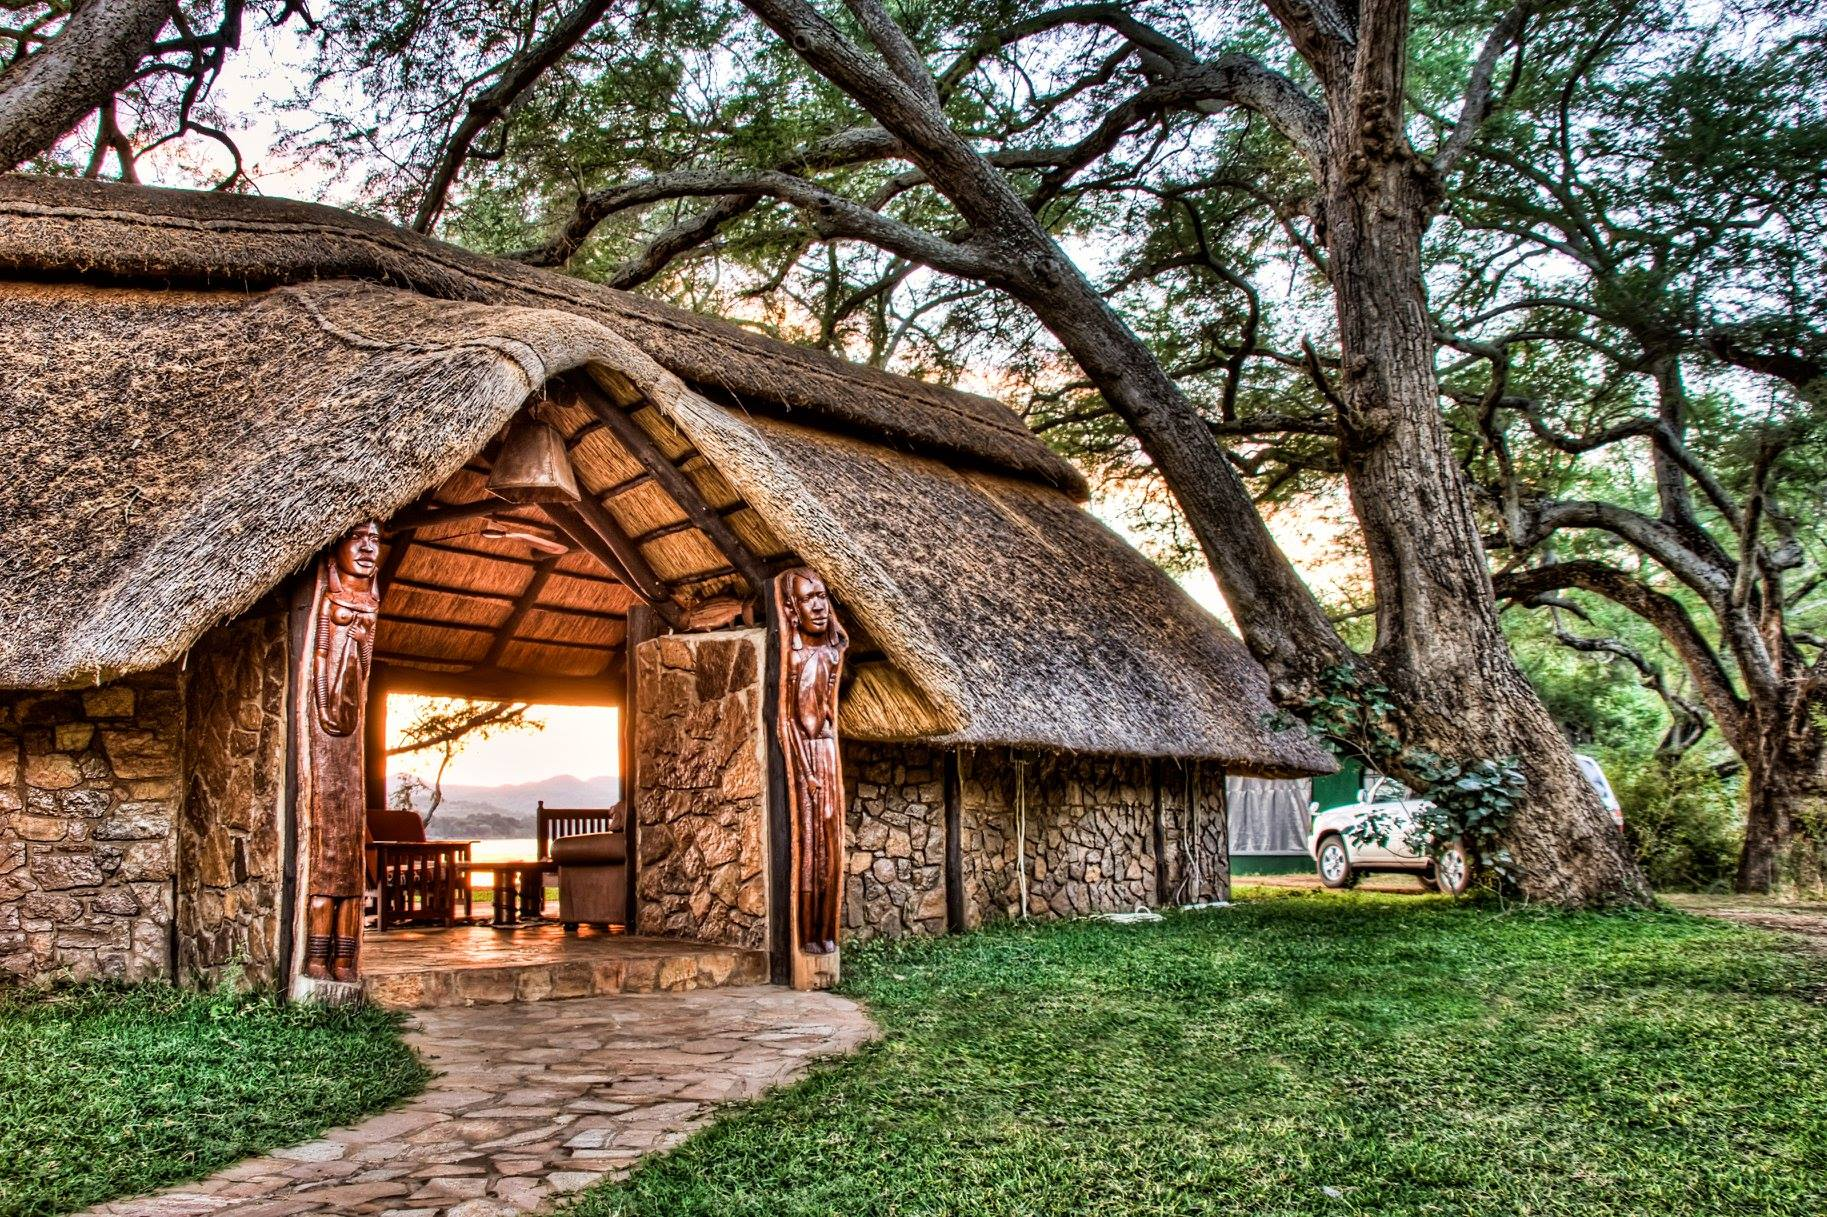 Chewore Lodge and Campsite